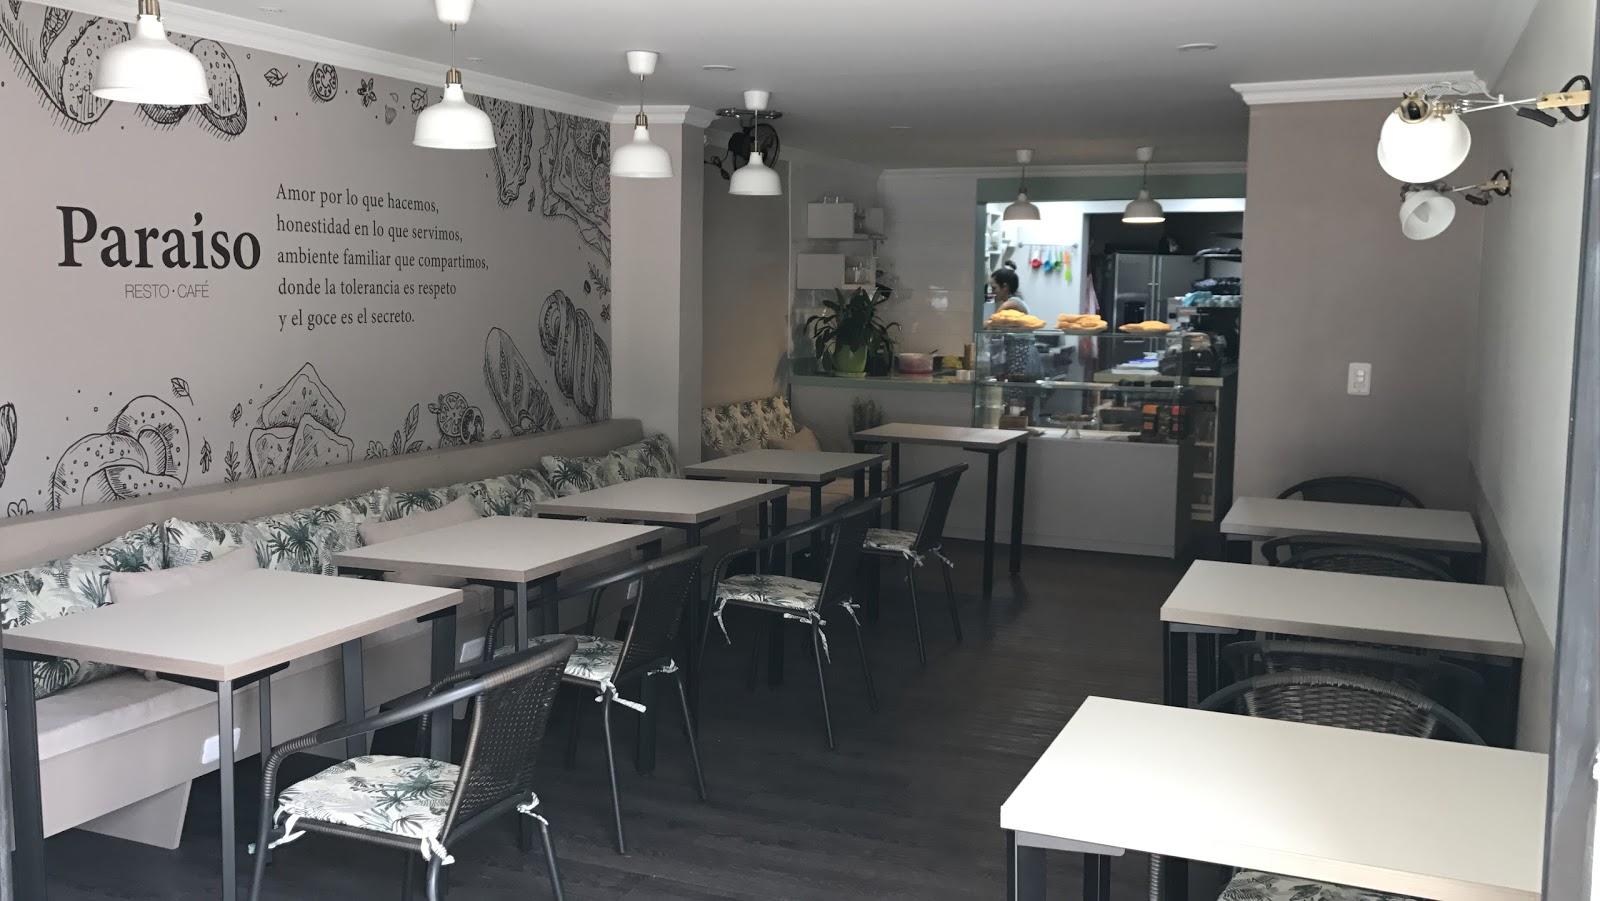 Paraiso - Resto Café: A Work-Friendly Place in Medellin